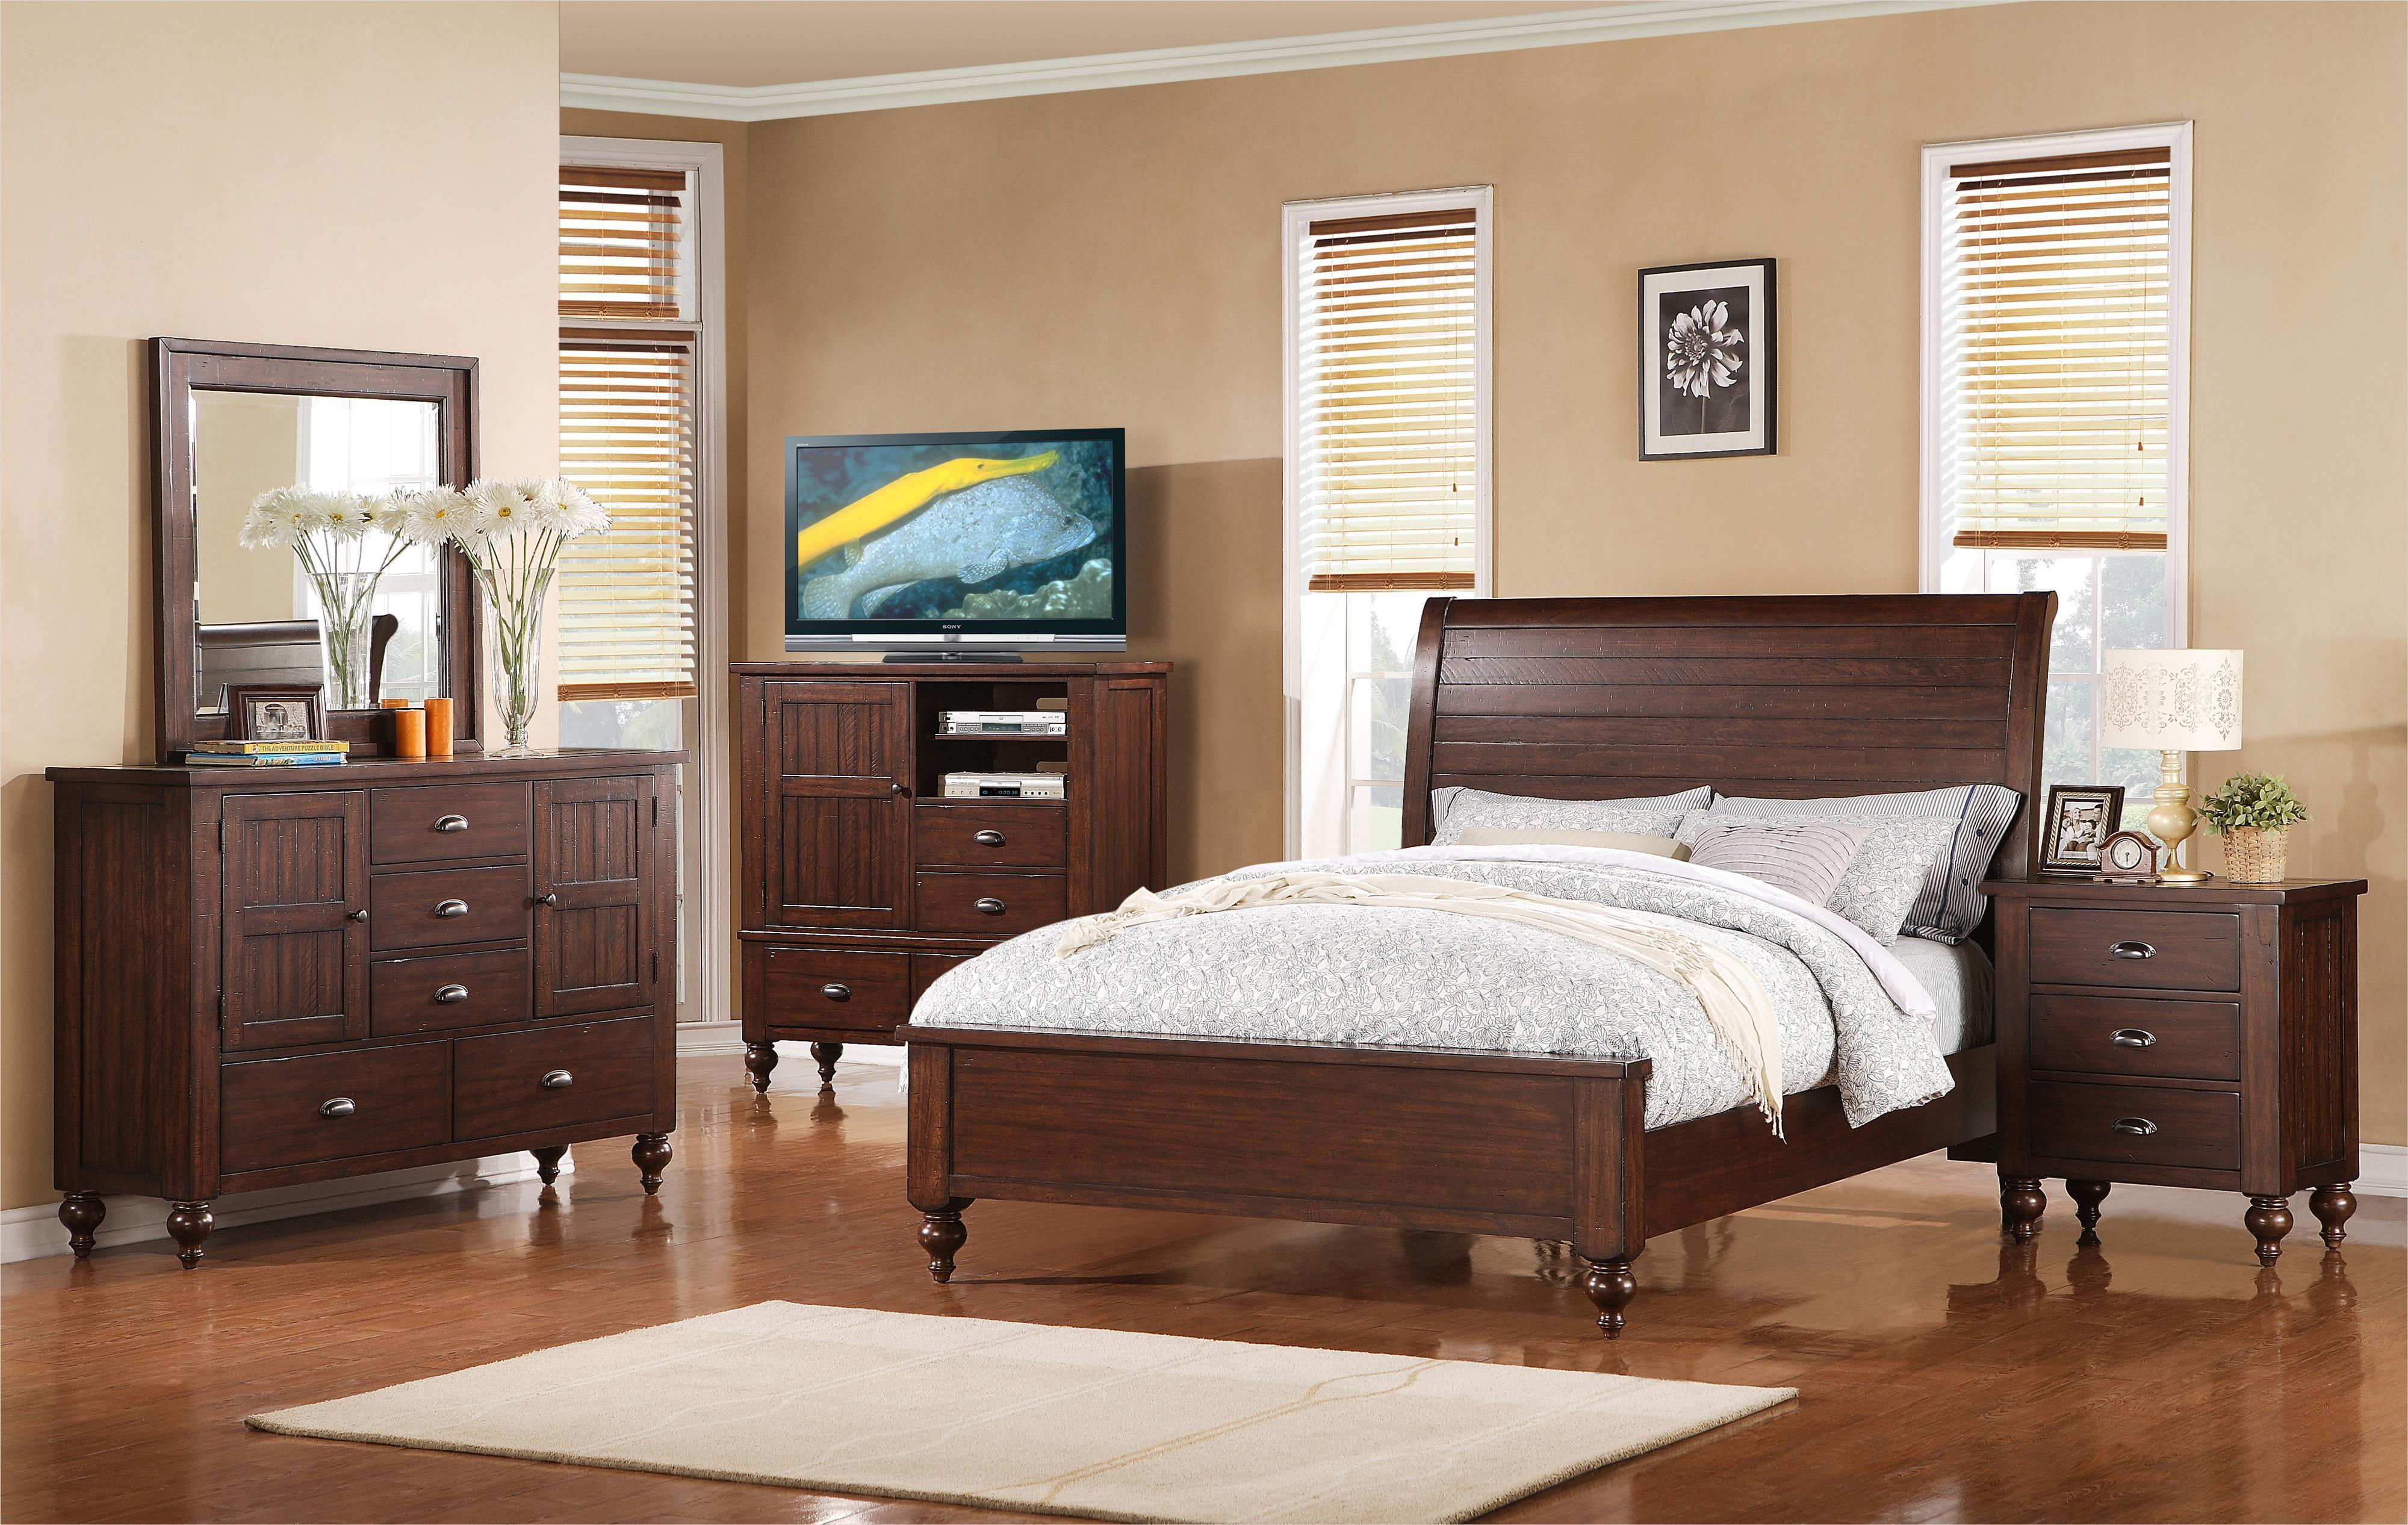 Riverside Furniture Castlewood Queen Bedroom Group - Item Number: 335 Q Bedroom Group 1